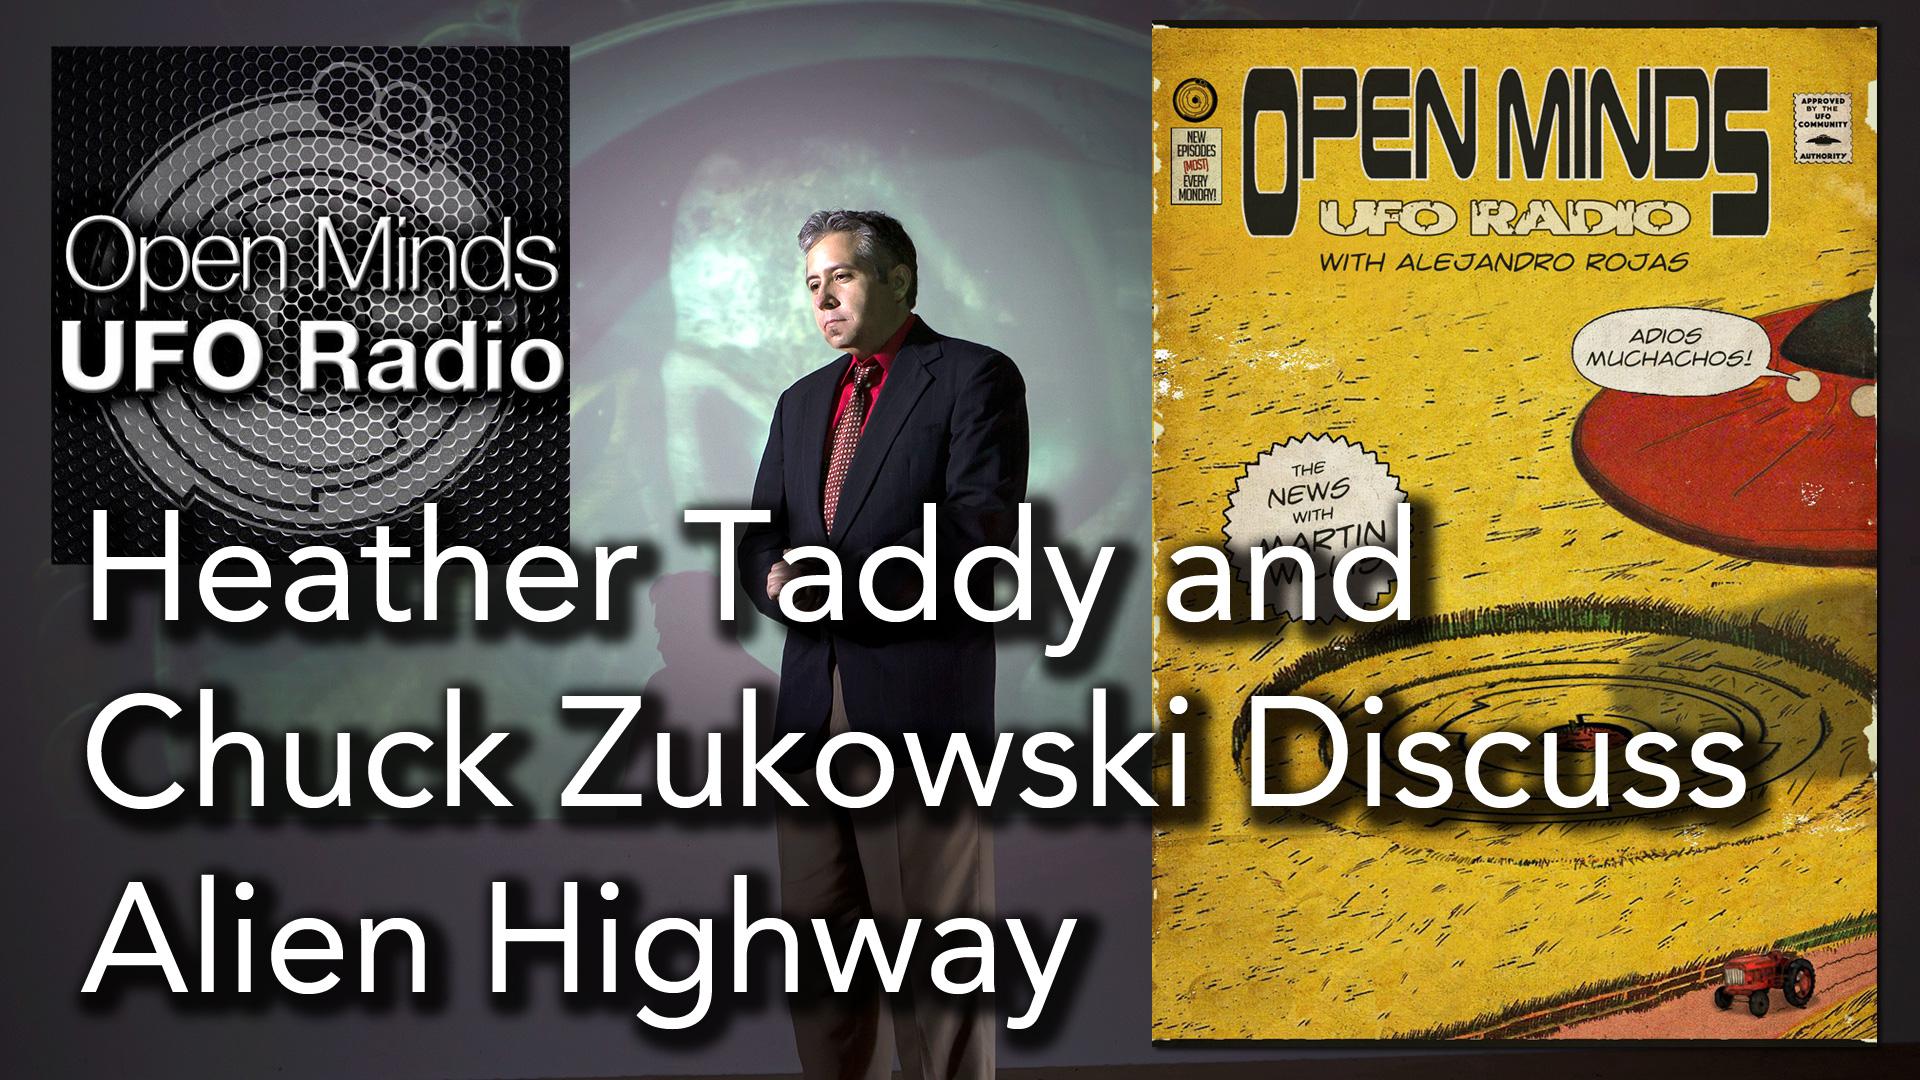 Heather Taddy and Chuck Zukowski Discuss Their New Show Alien Highway on Open Minds UFO Radio